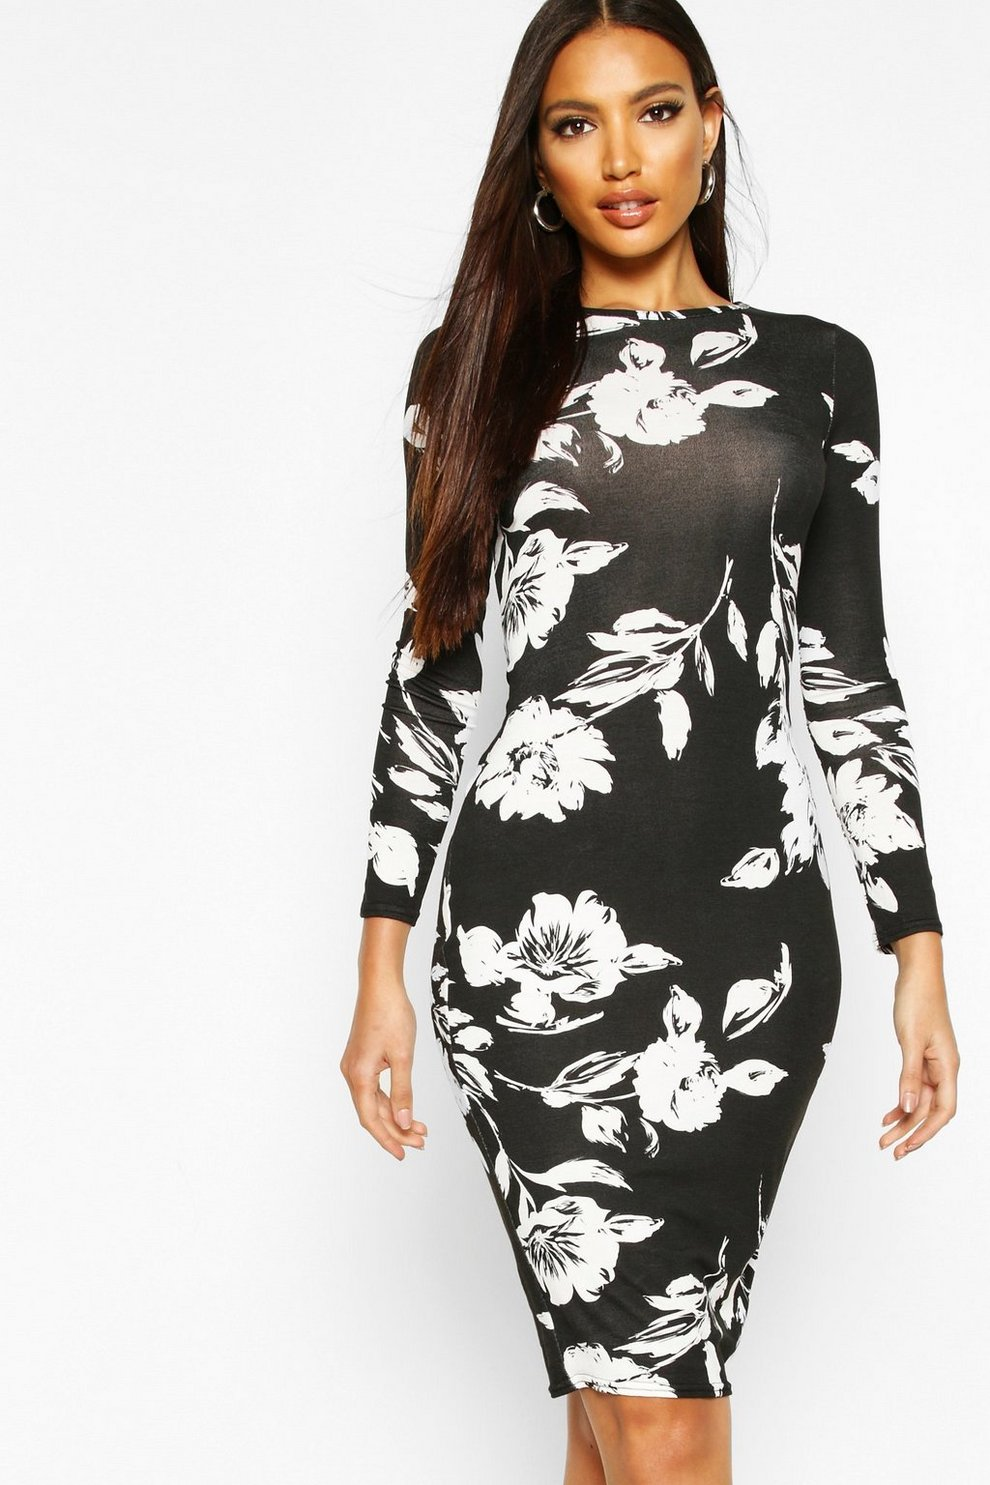 dddec49015 Womens Multi Long Sleeve Midi Bodycon Dress. Hover to zoom